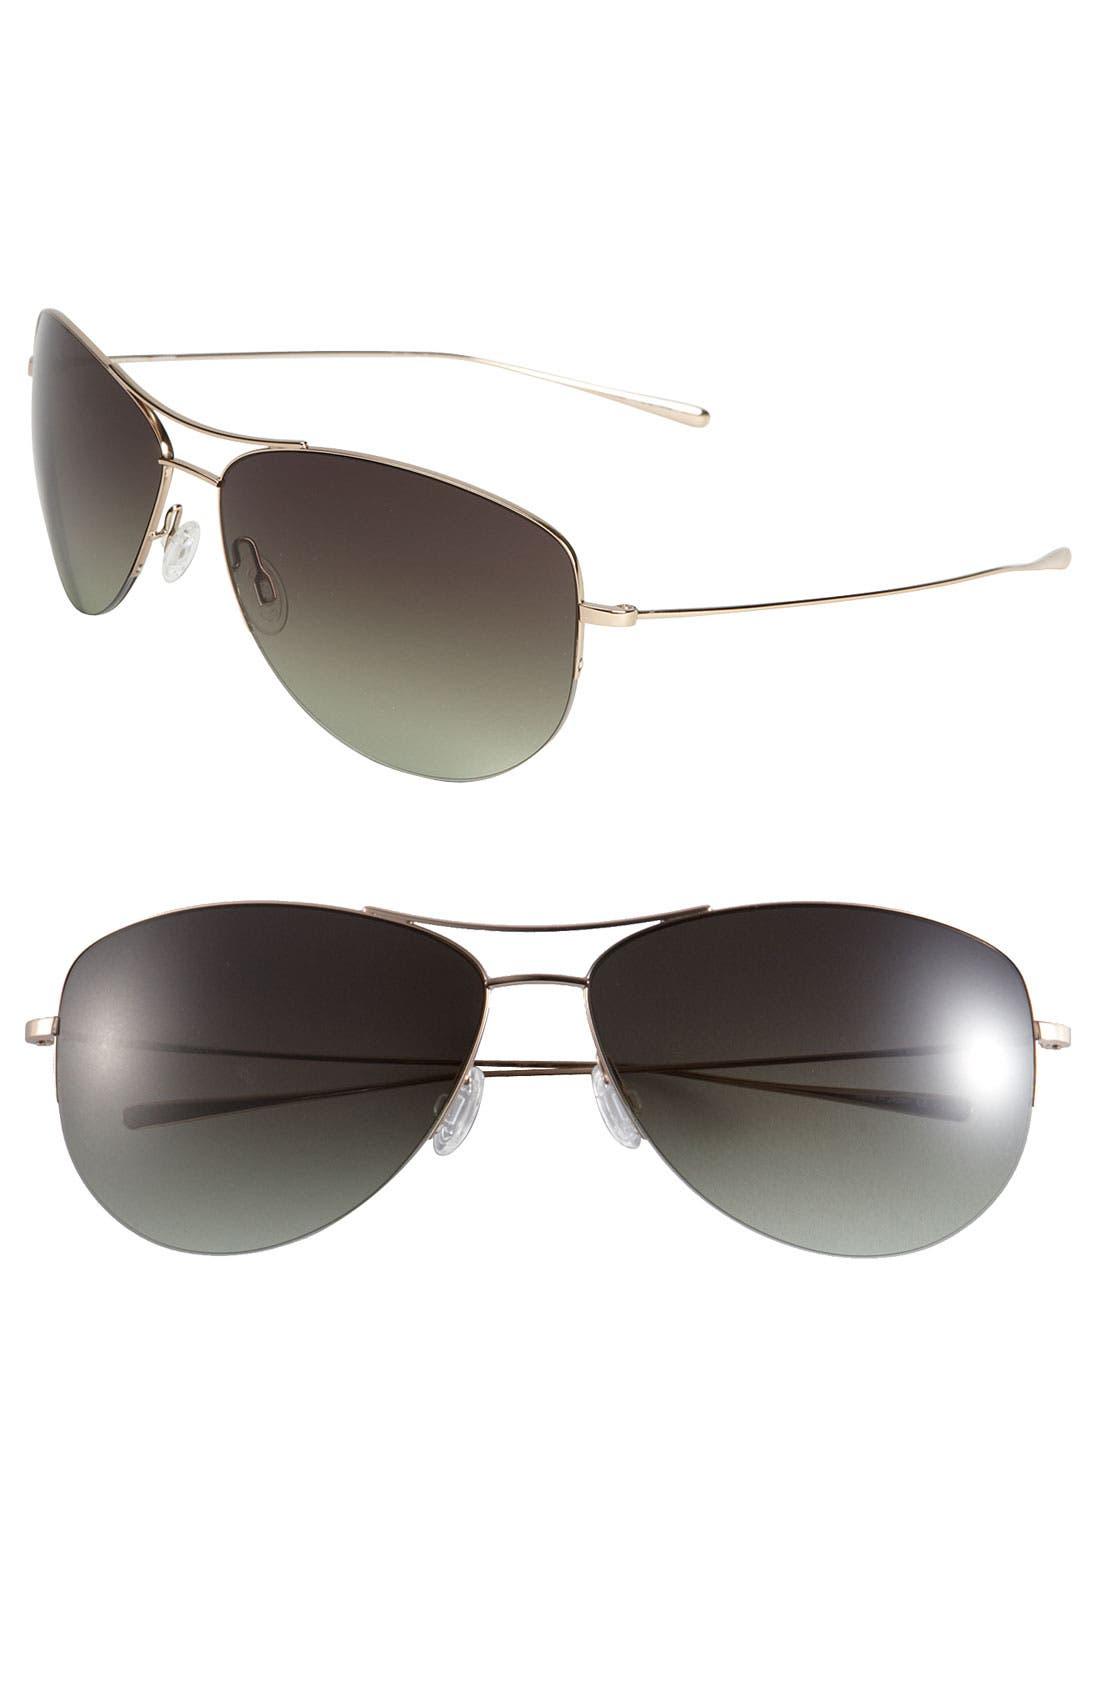 Main Image - Oliver Peoples 'Strummer' 63mm Metal Aviator Sunglasses